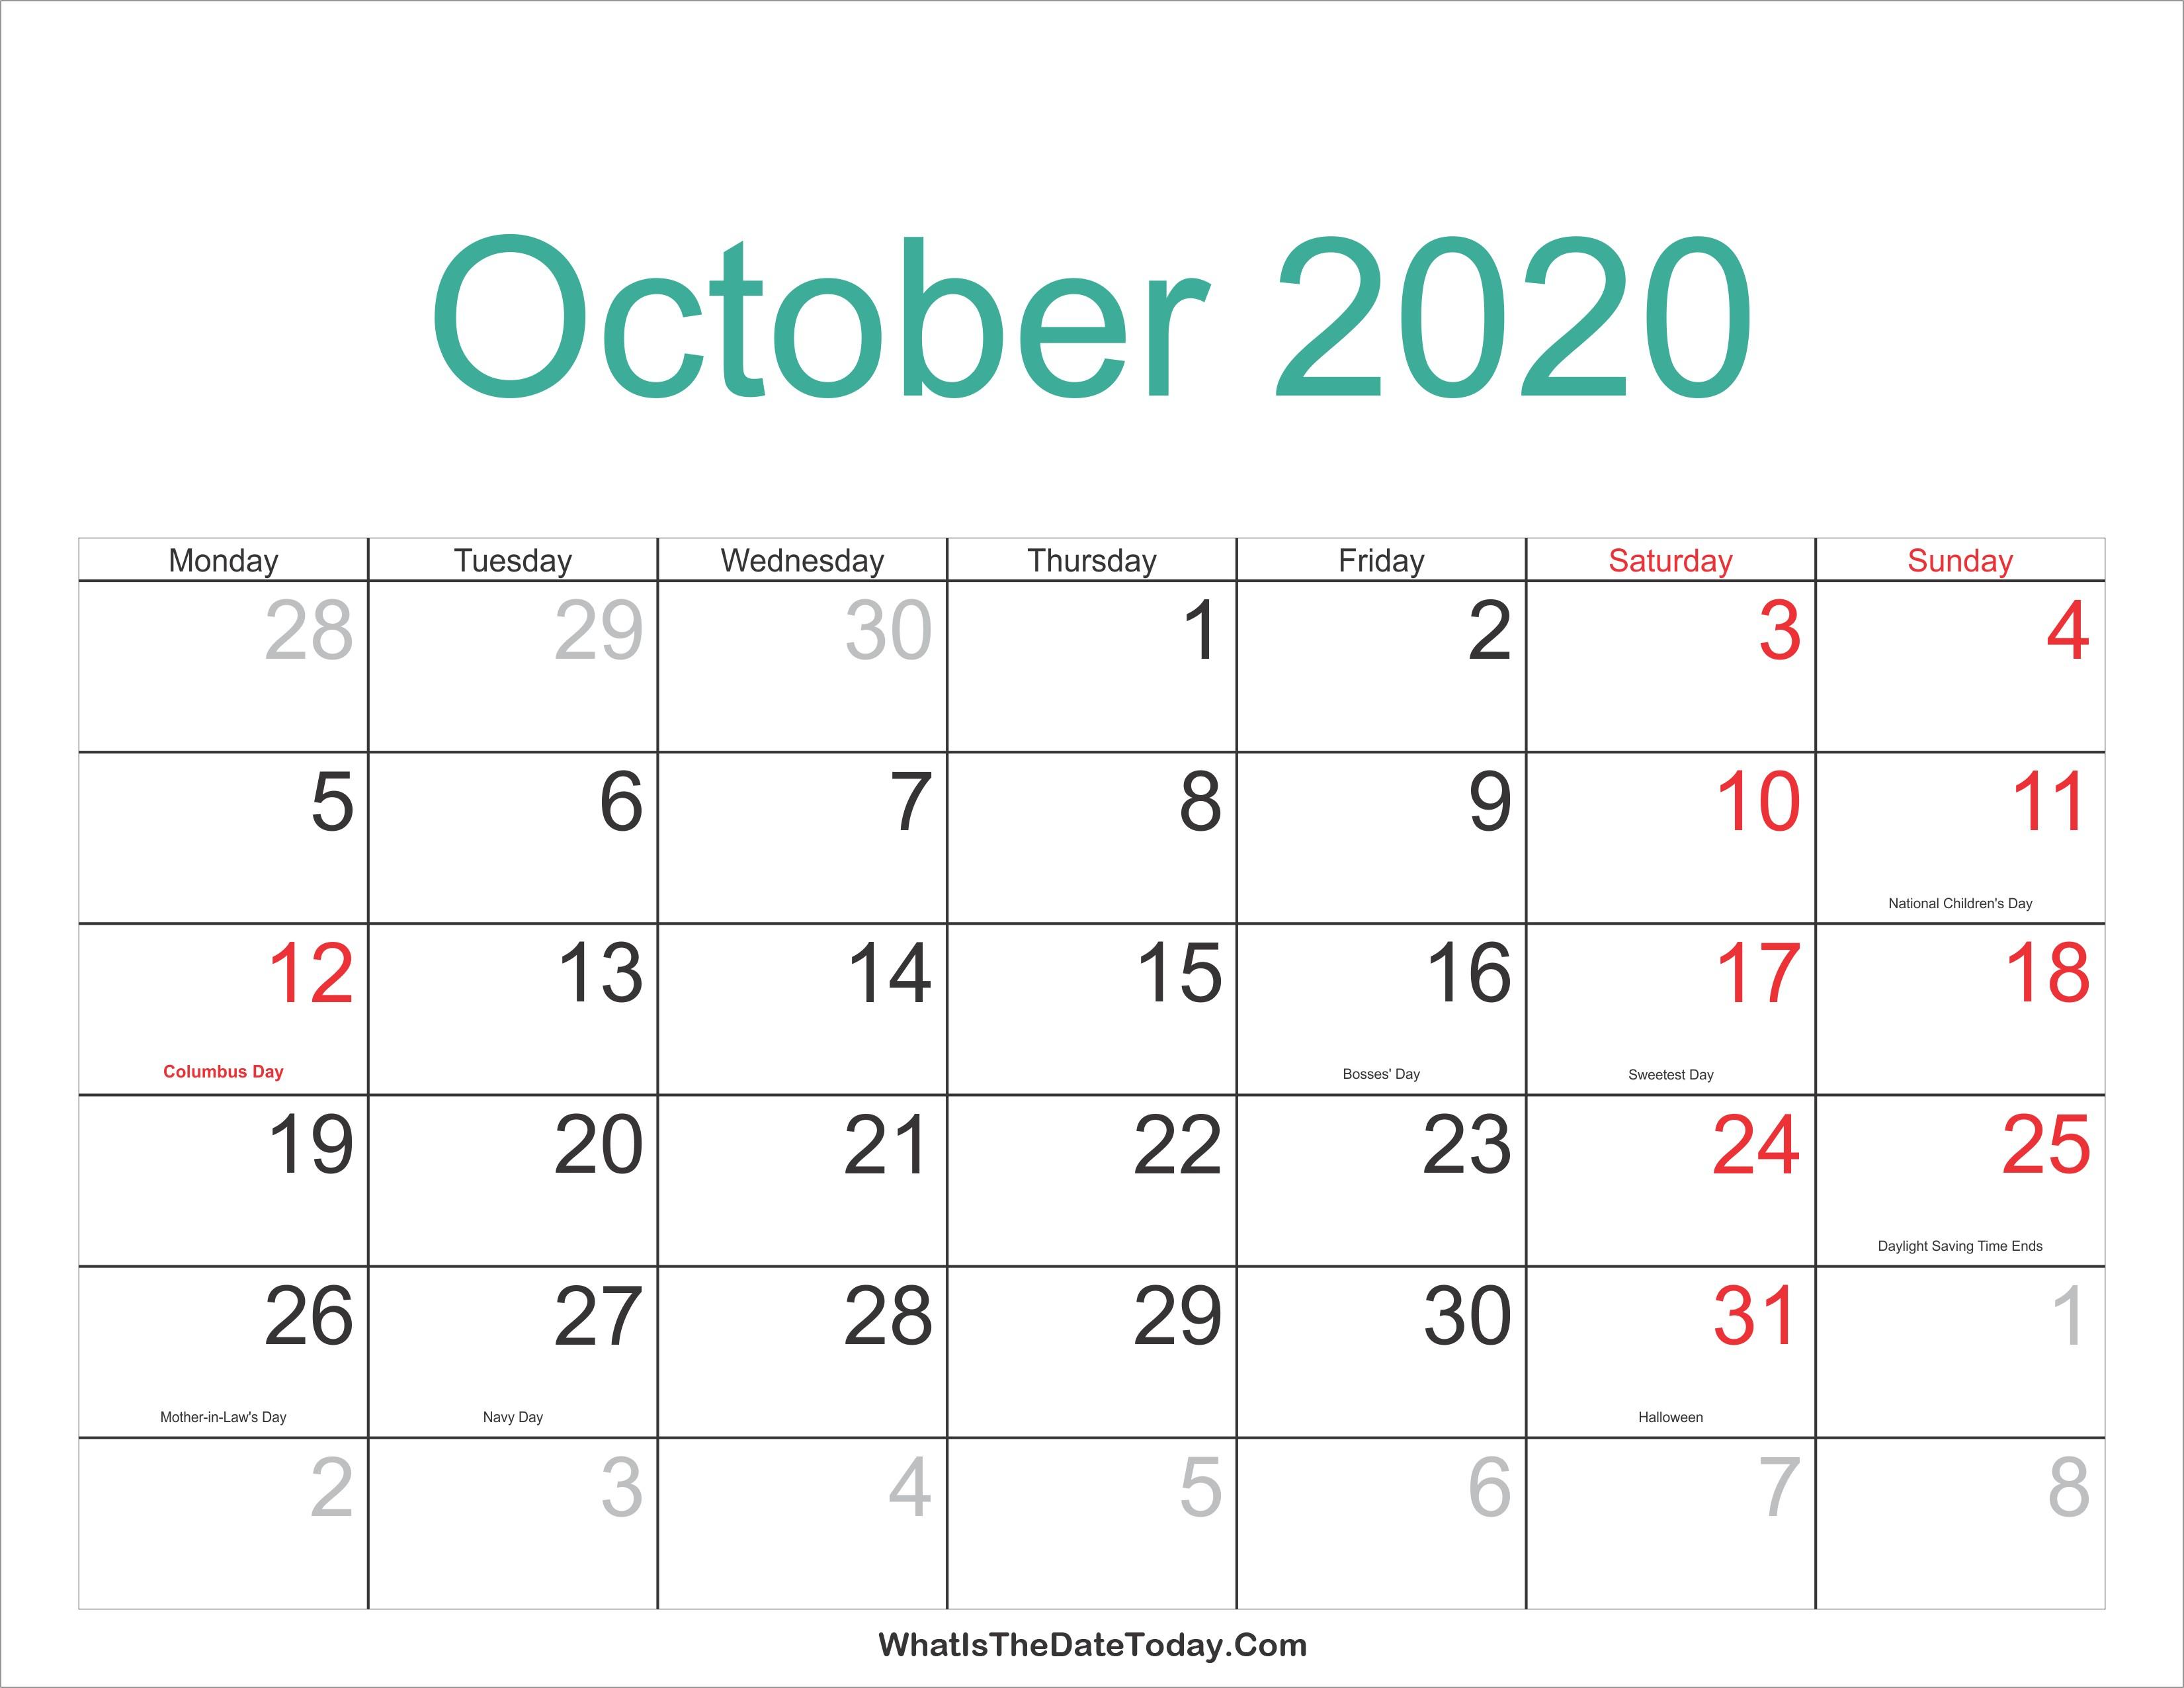 October 2020 Calendar | Thekpark-Hadong